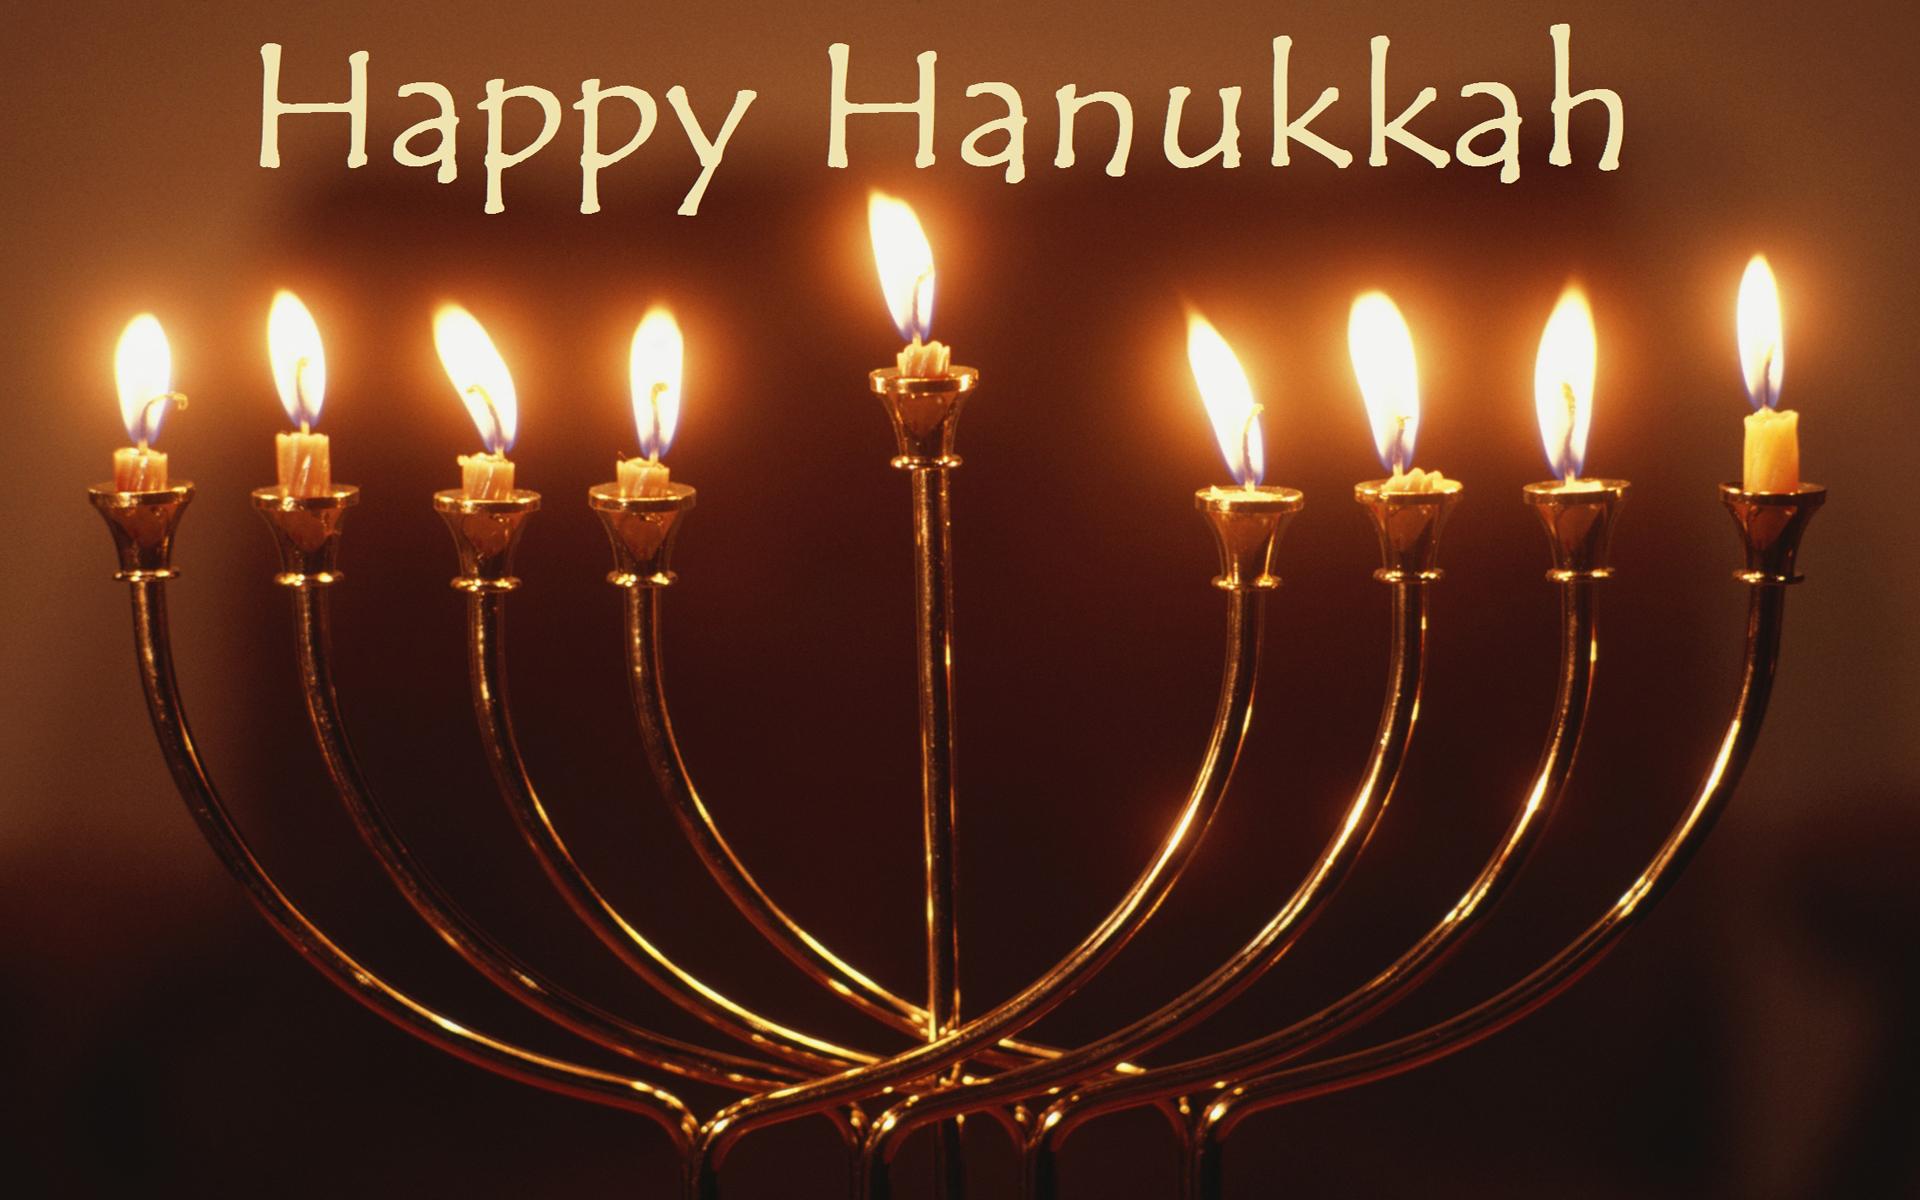 happy hanukkah authorstream - photo #4